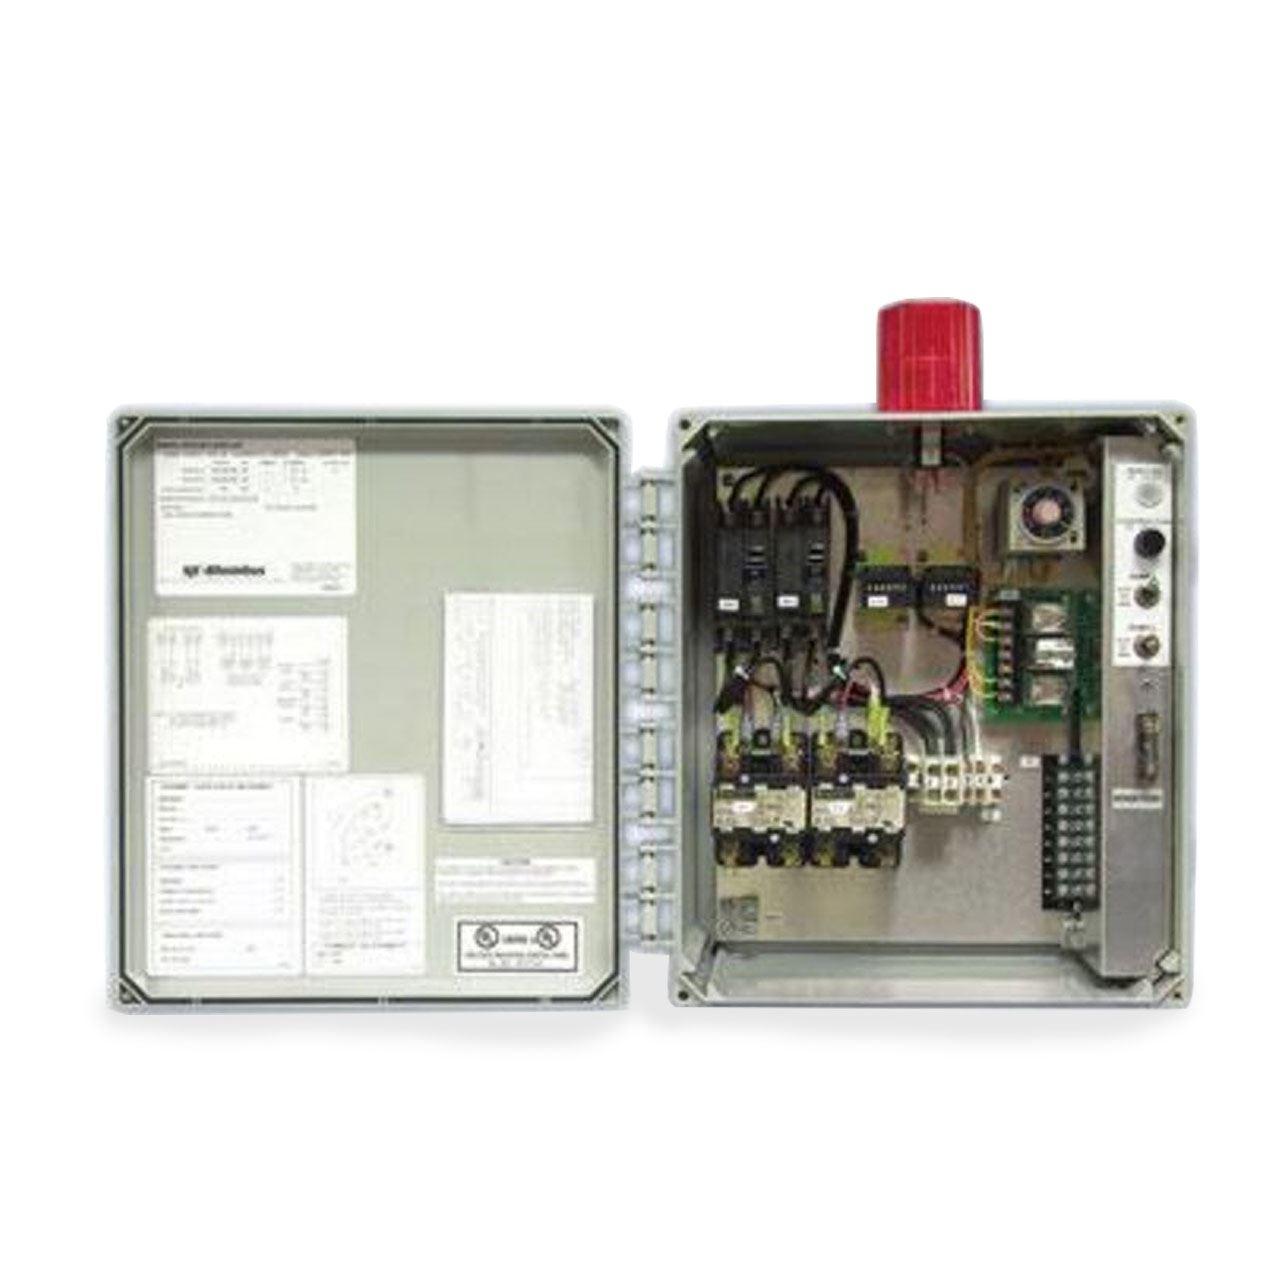 sje rhombus sje rhombus model dtd timed dosing duplex 120 208 240 rh rcworst com Motor Control Wiring Diagrams Motor Control Wiring Diagrams